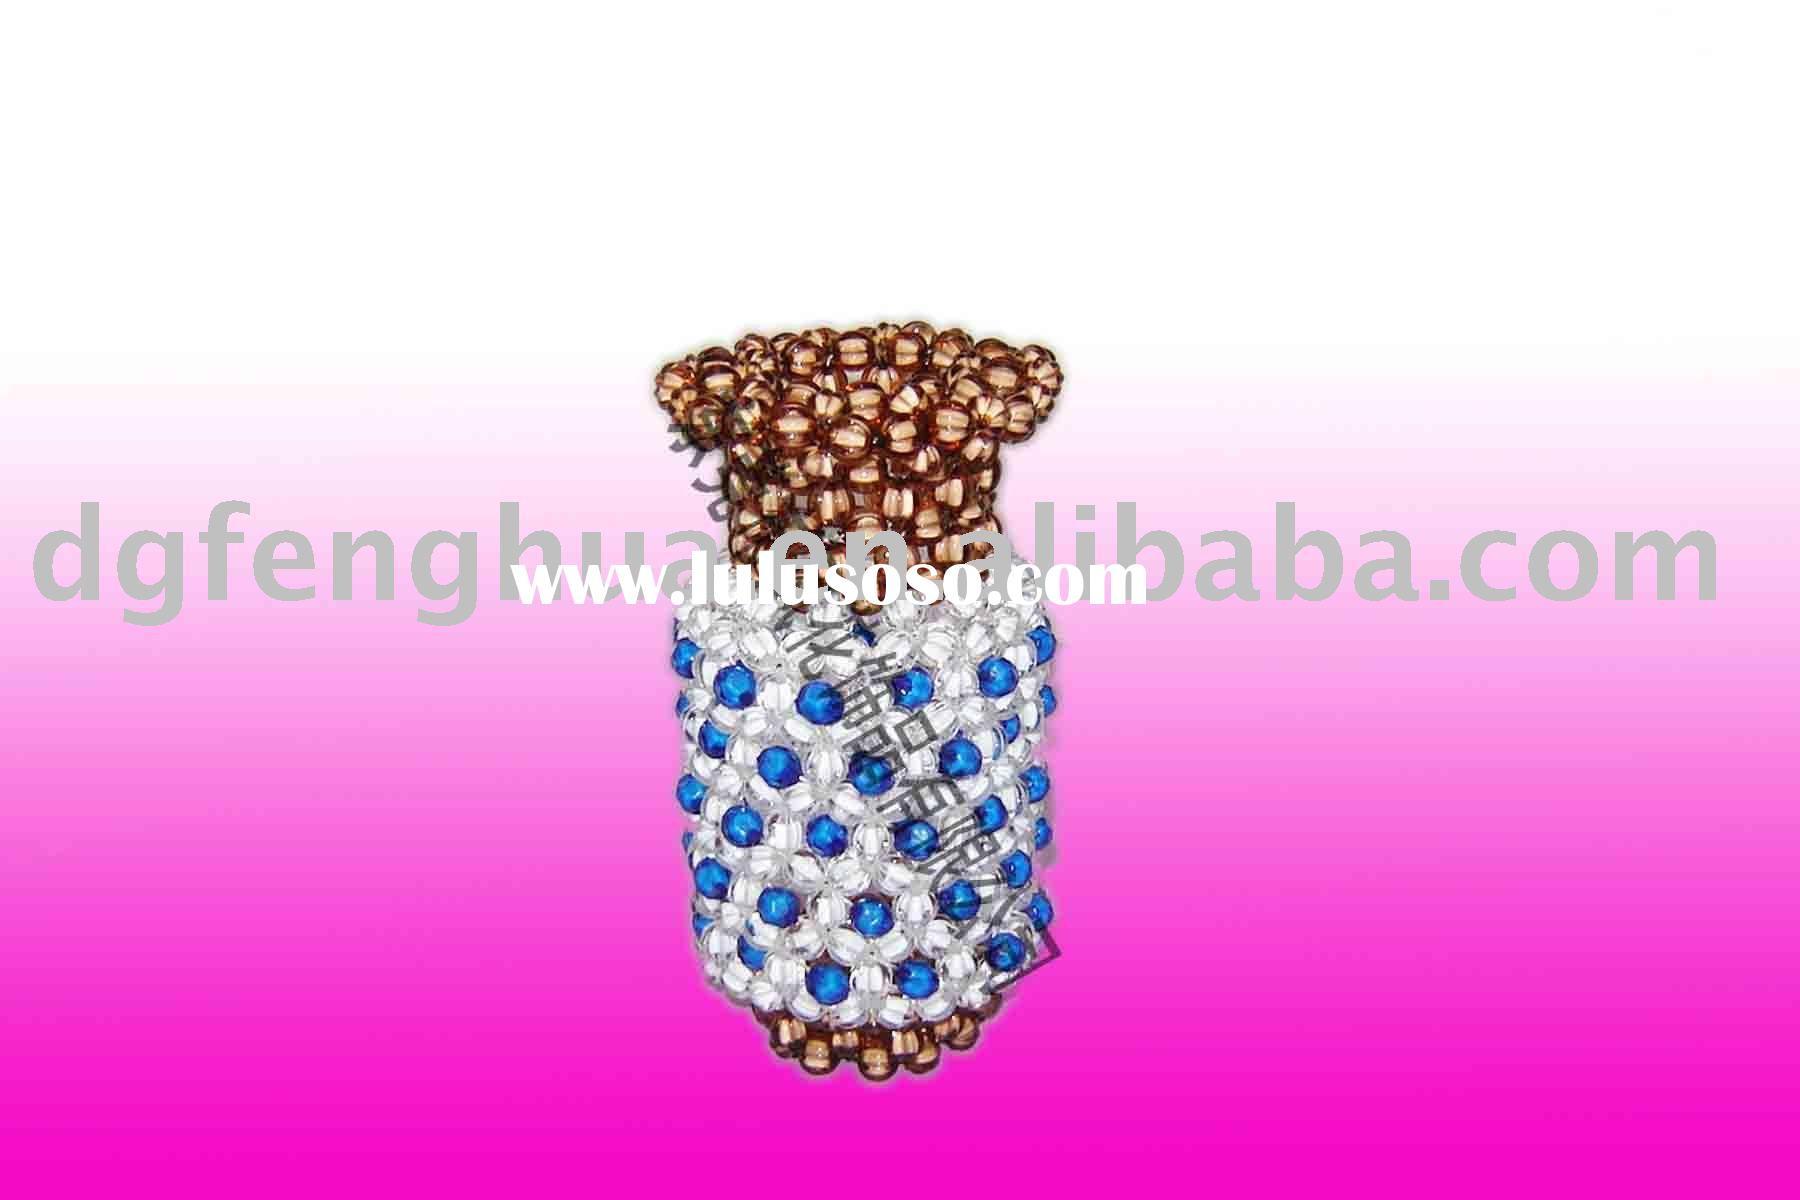 mikasa crystal vase value of crystal flower vase making flowers healthy inside decoration flower vase decoration flower vase manufacturers in lulusoso page 1